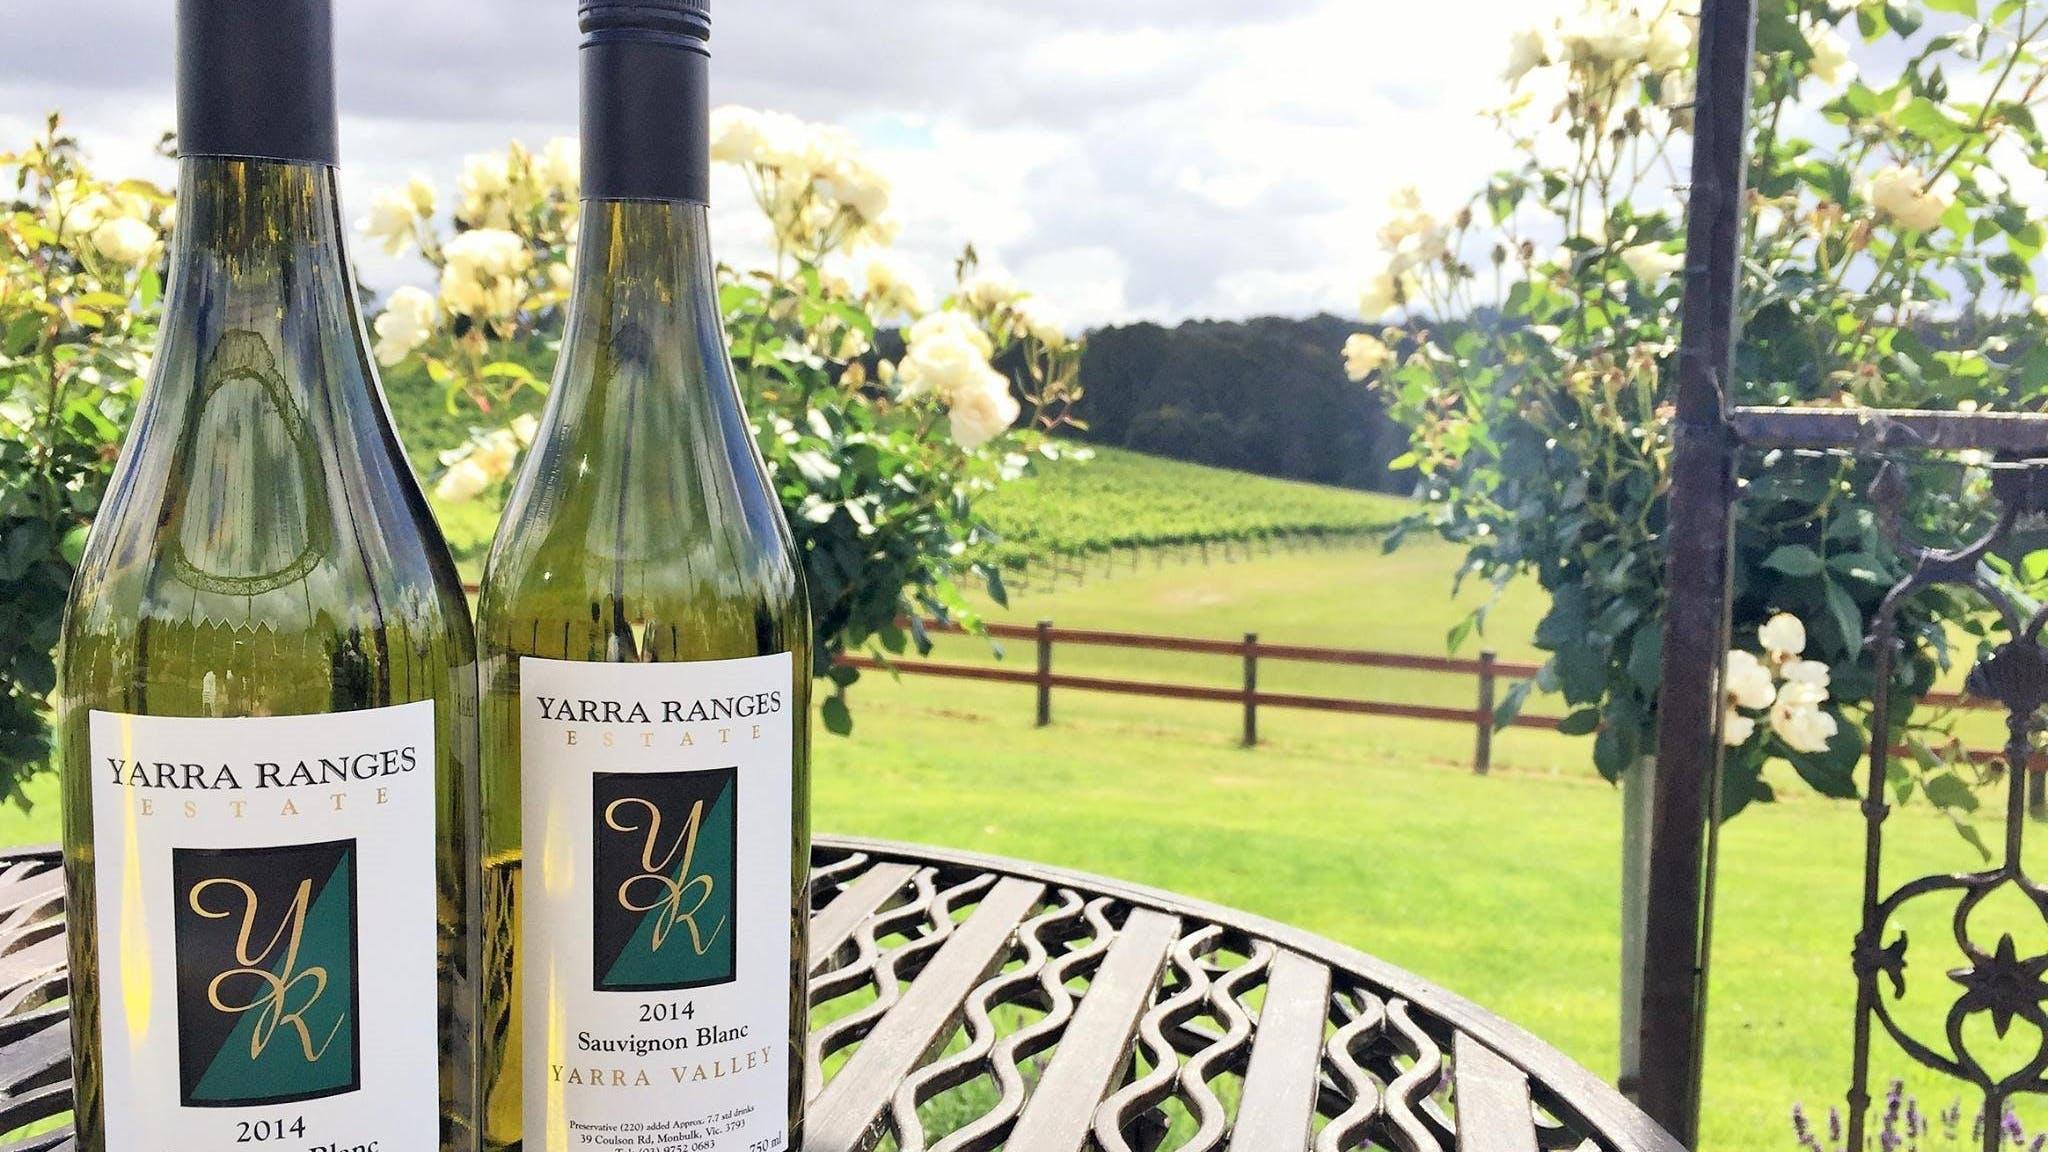 Yarra Ranges Estate Sauvignon Blanc 2014